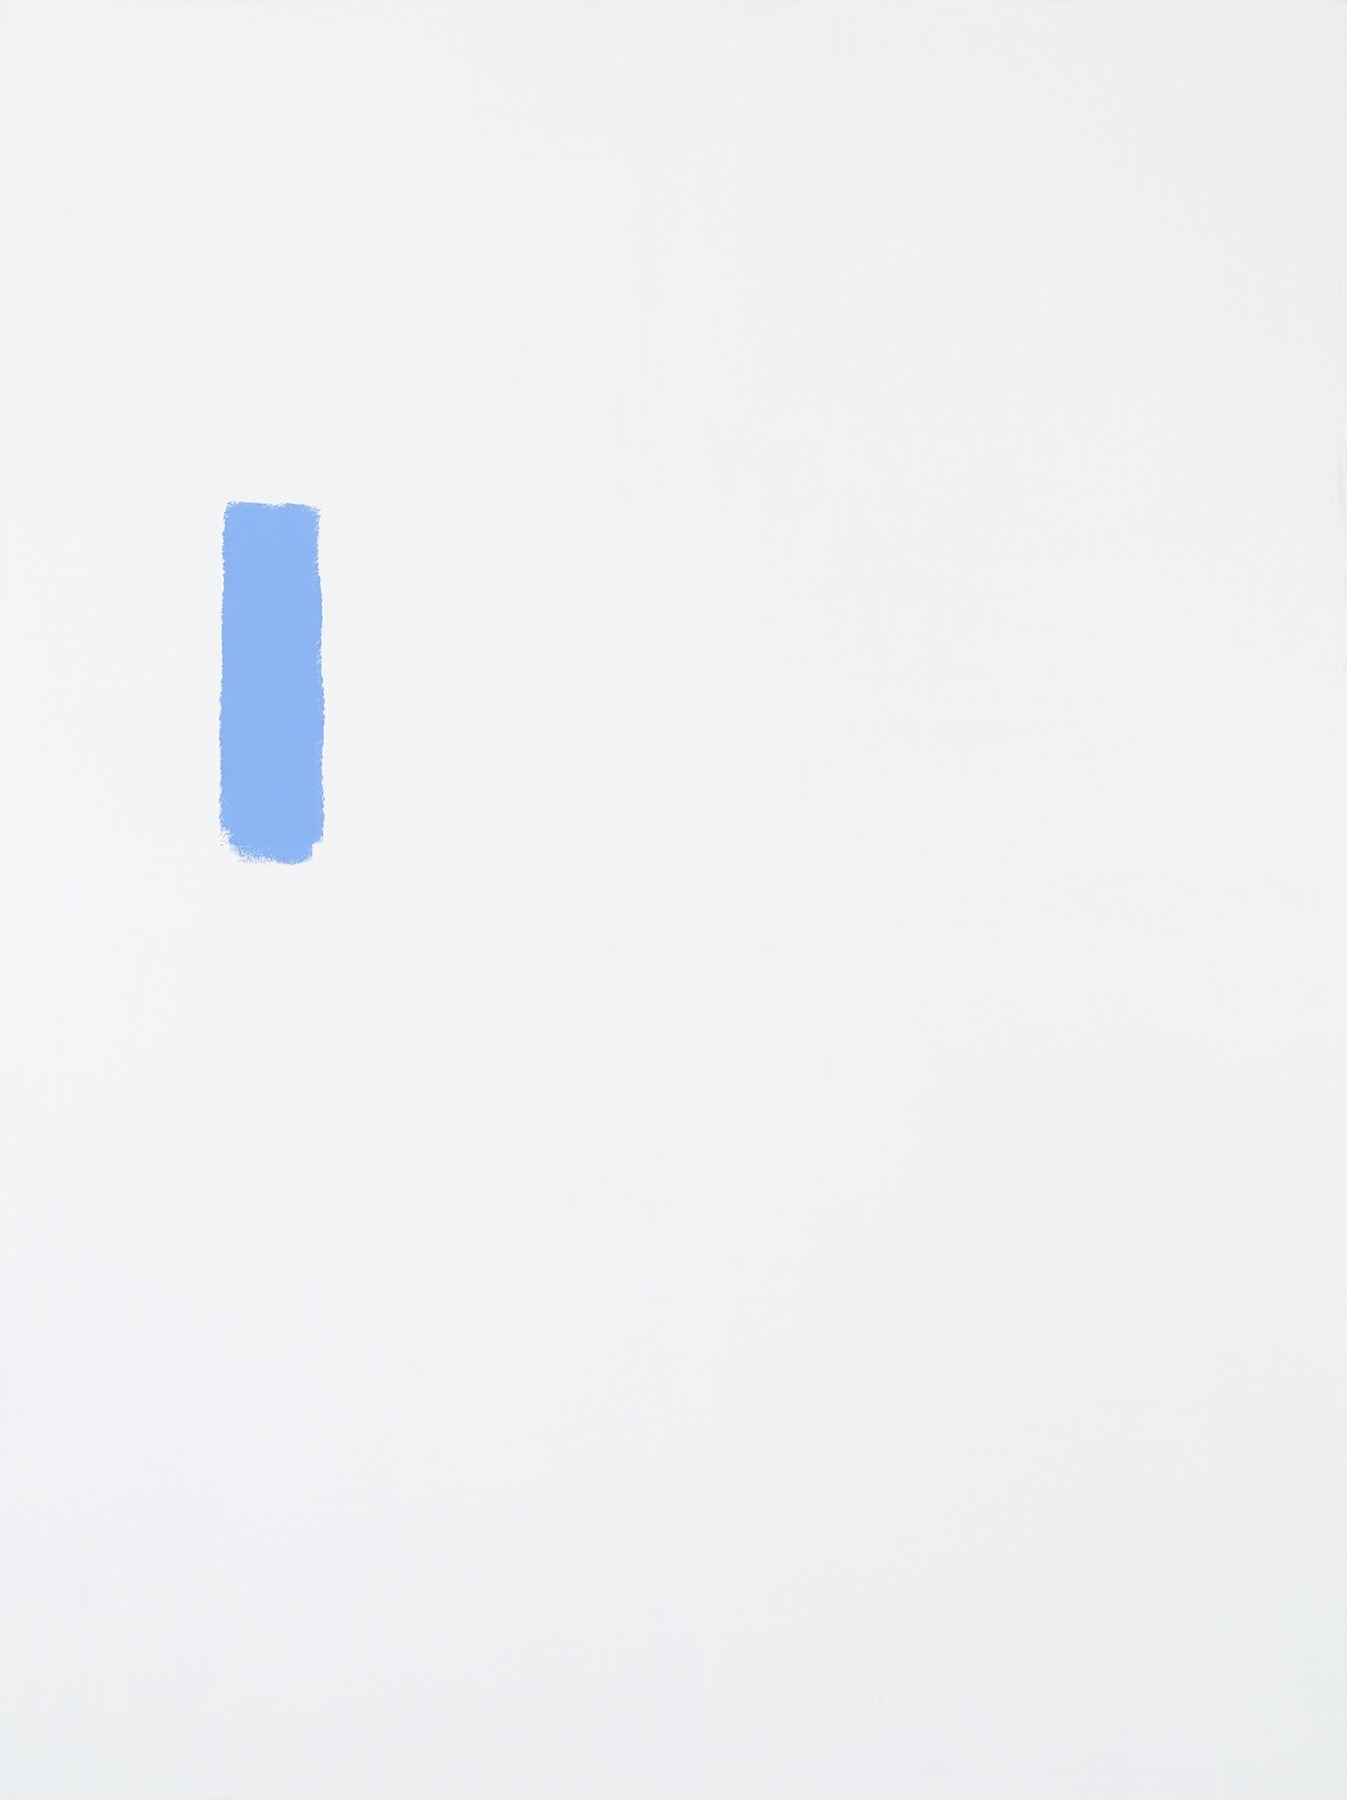 Michael Krebber MK.306, 2015 Acrylic on canvas  78 3/4 x 59 1/8 inches (200 x 150.2 cm) (